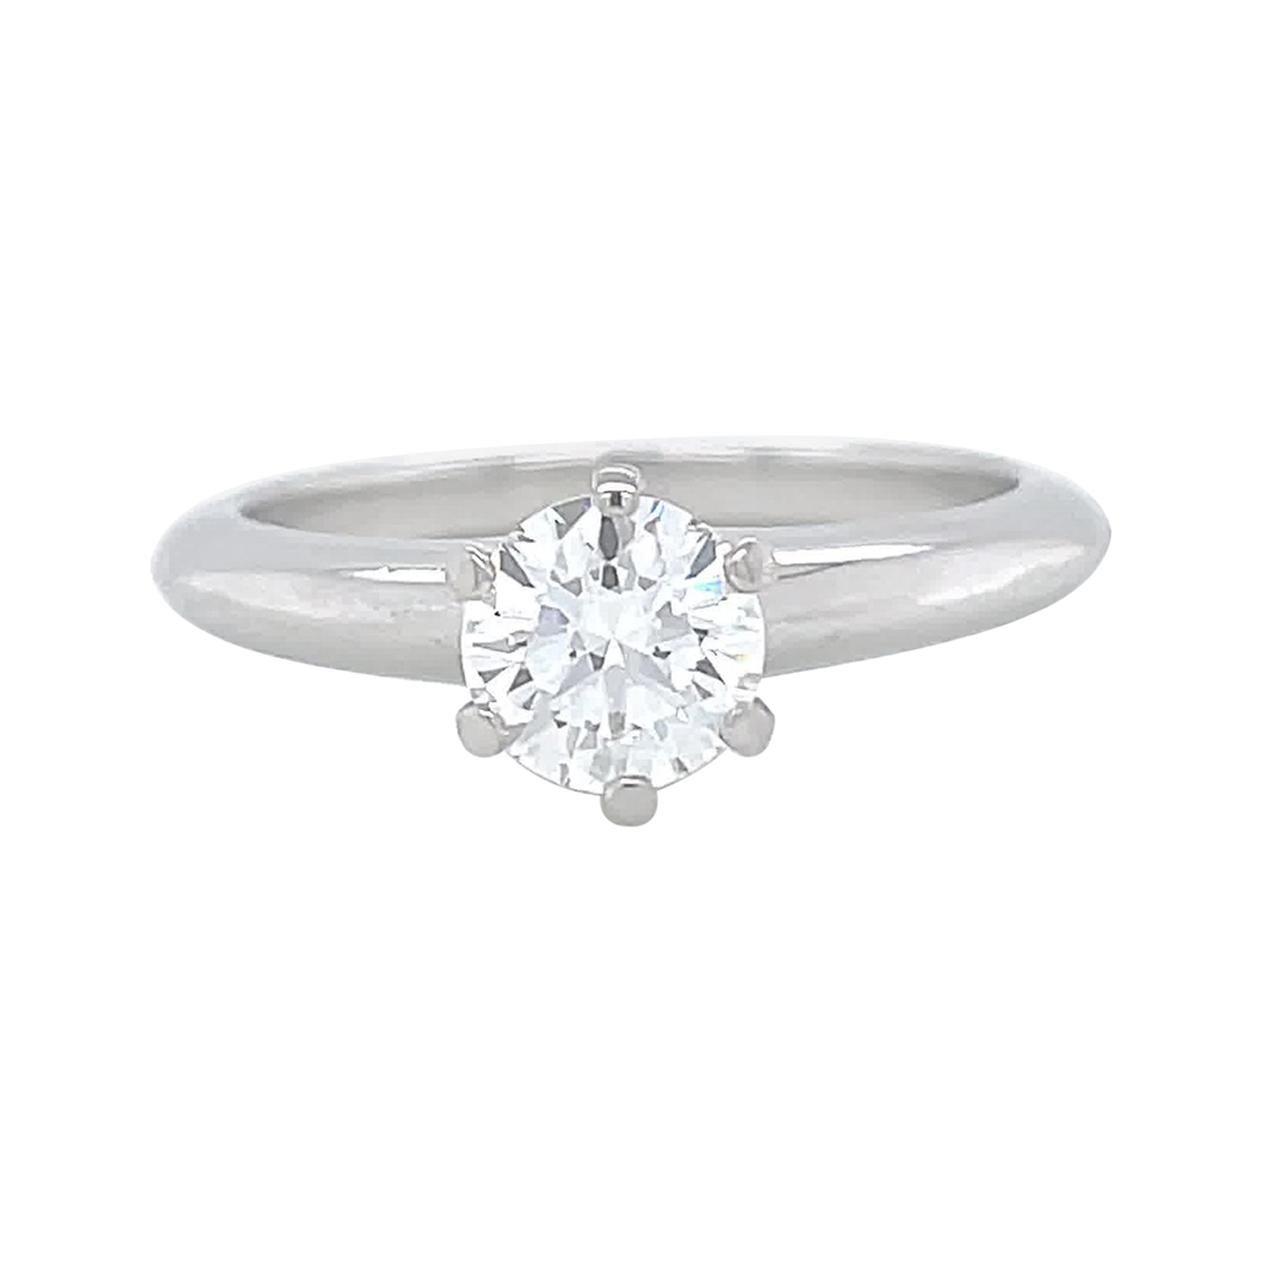 Vintage Tiffany & Co. GIA Round Cut Diamond Platinum Solitaire Engagement Ring